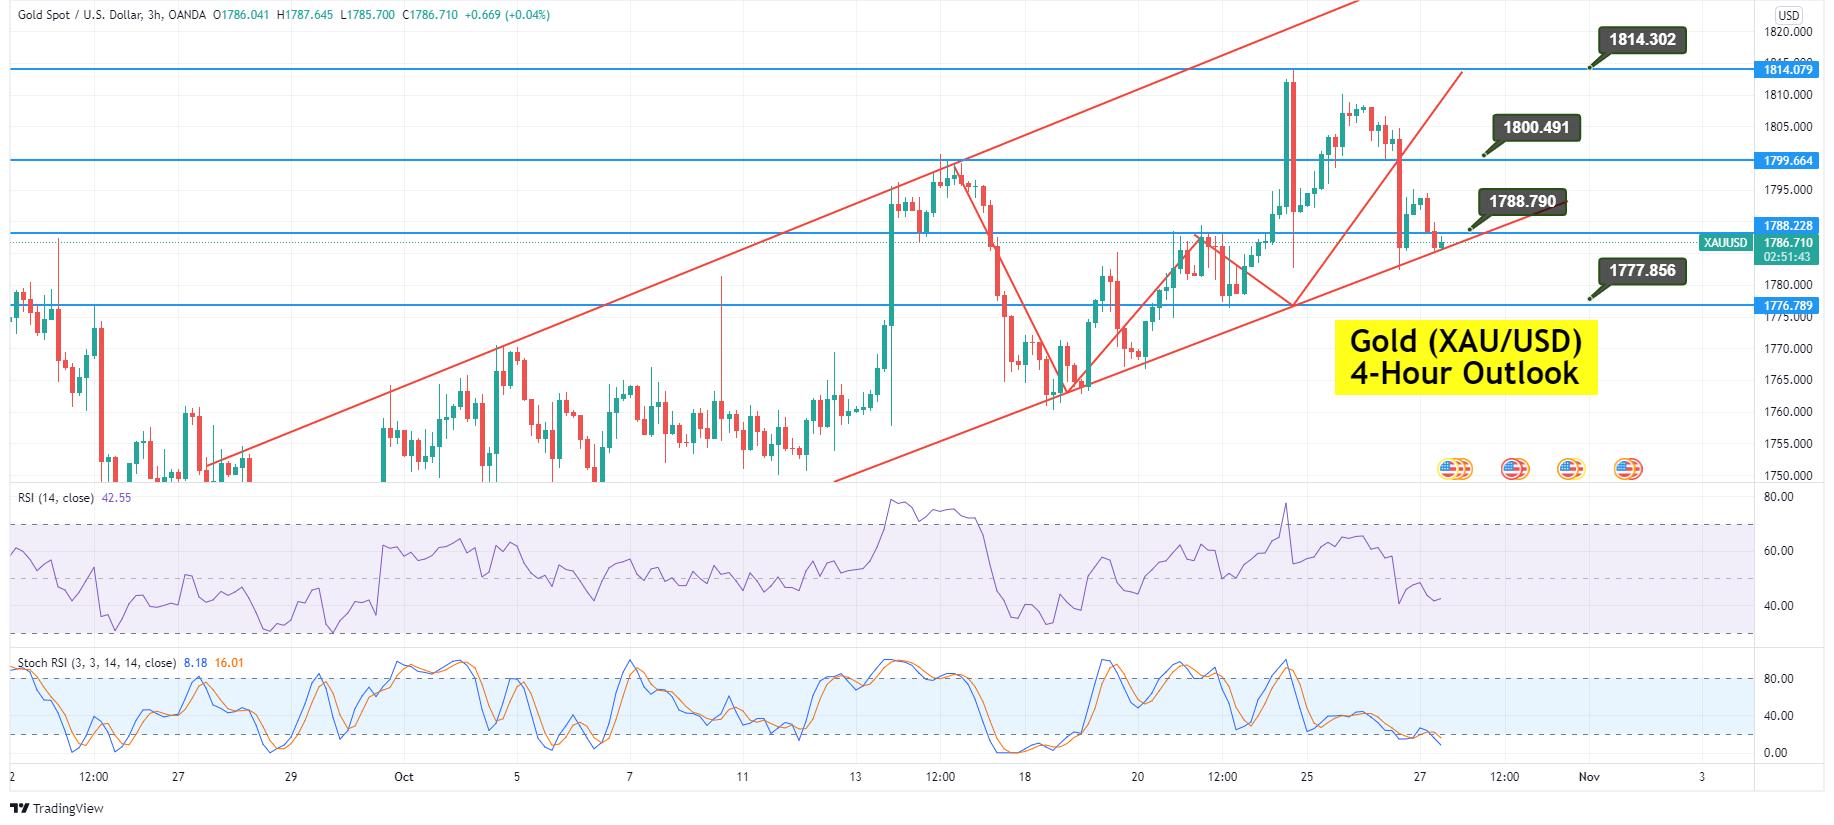 Gold Price Forecast: Upward Trendline Supports at ,786